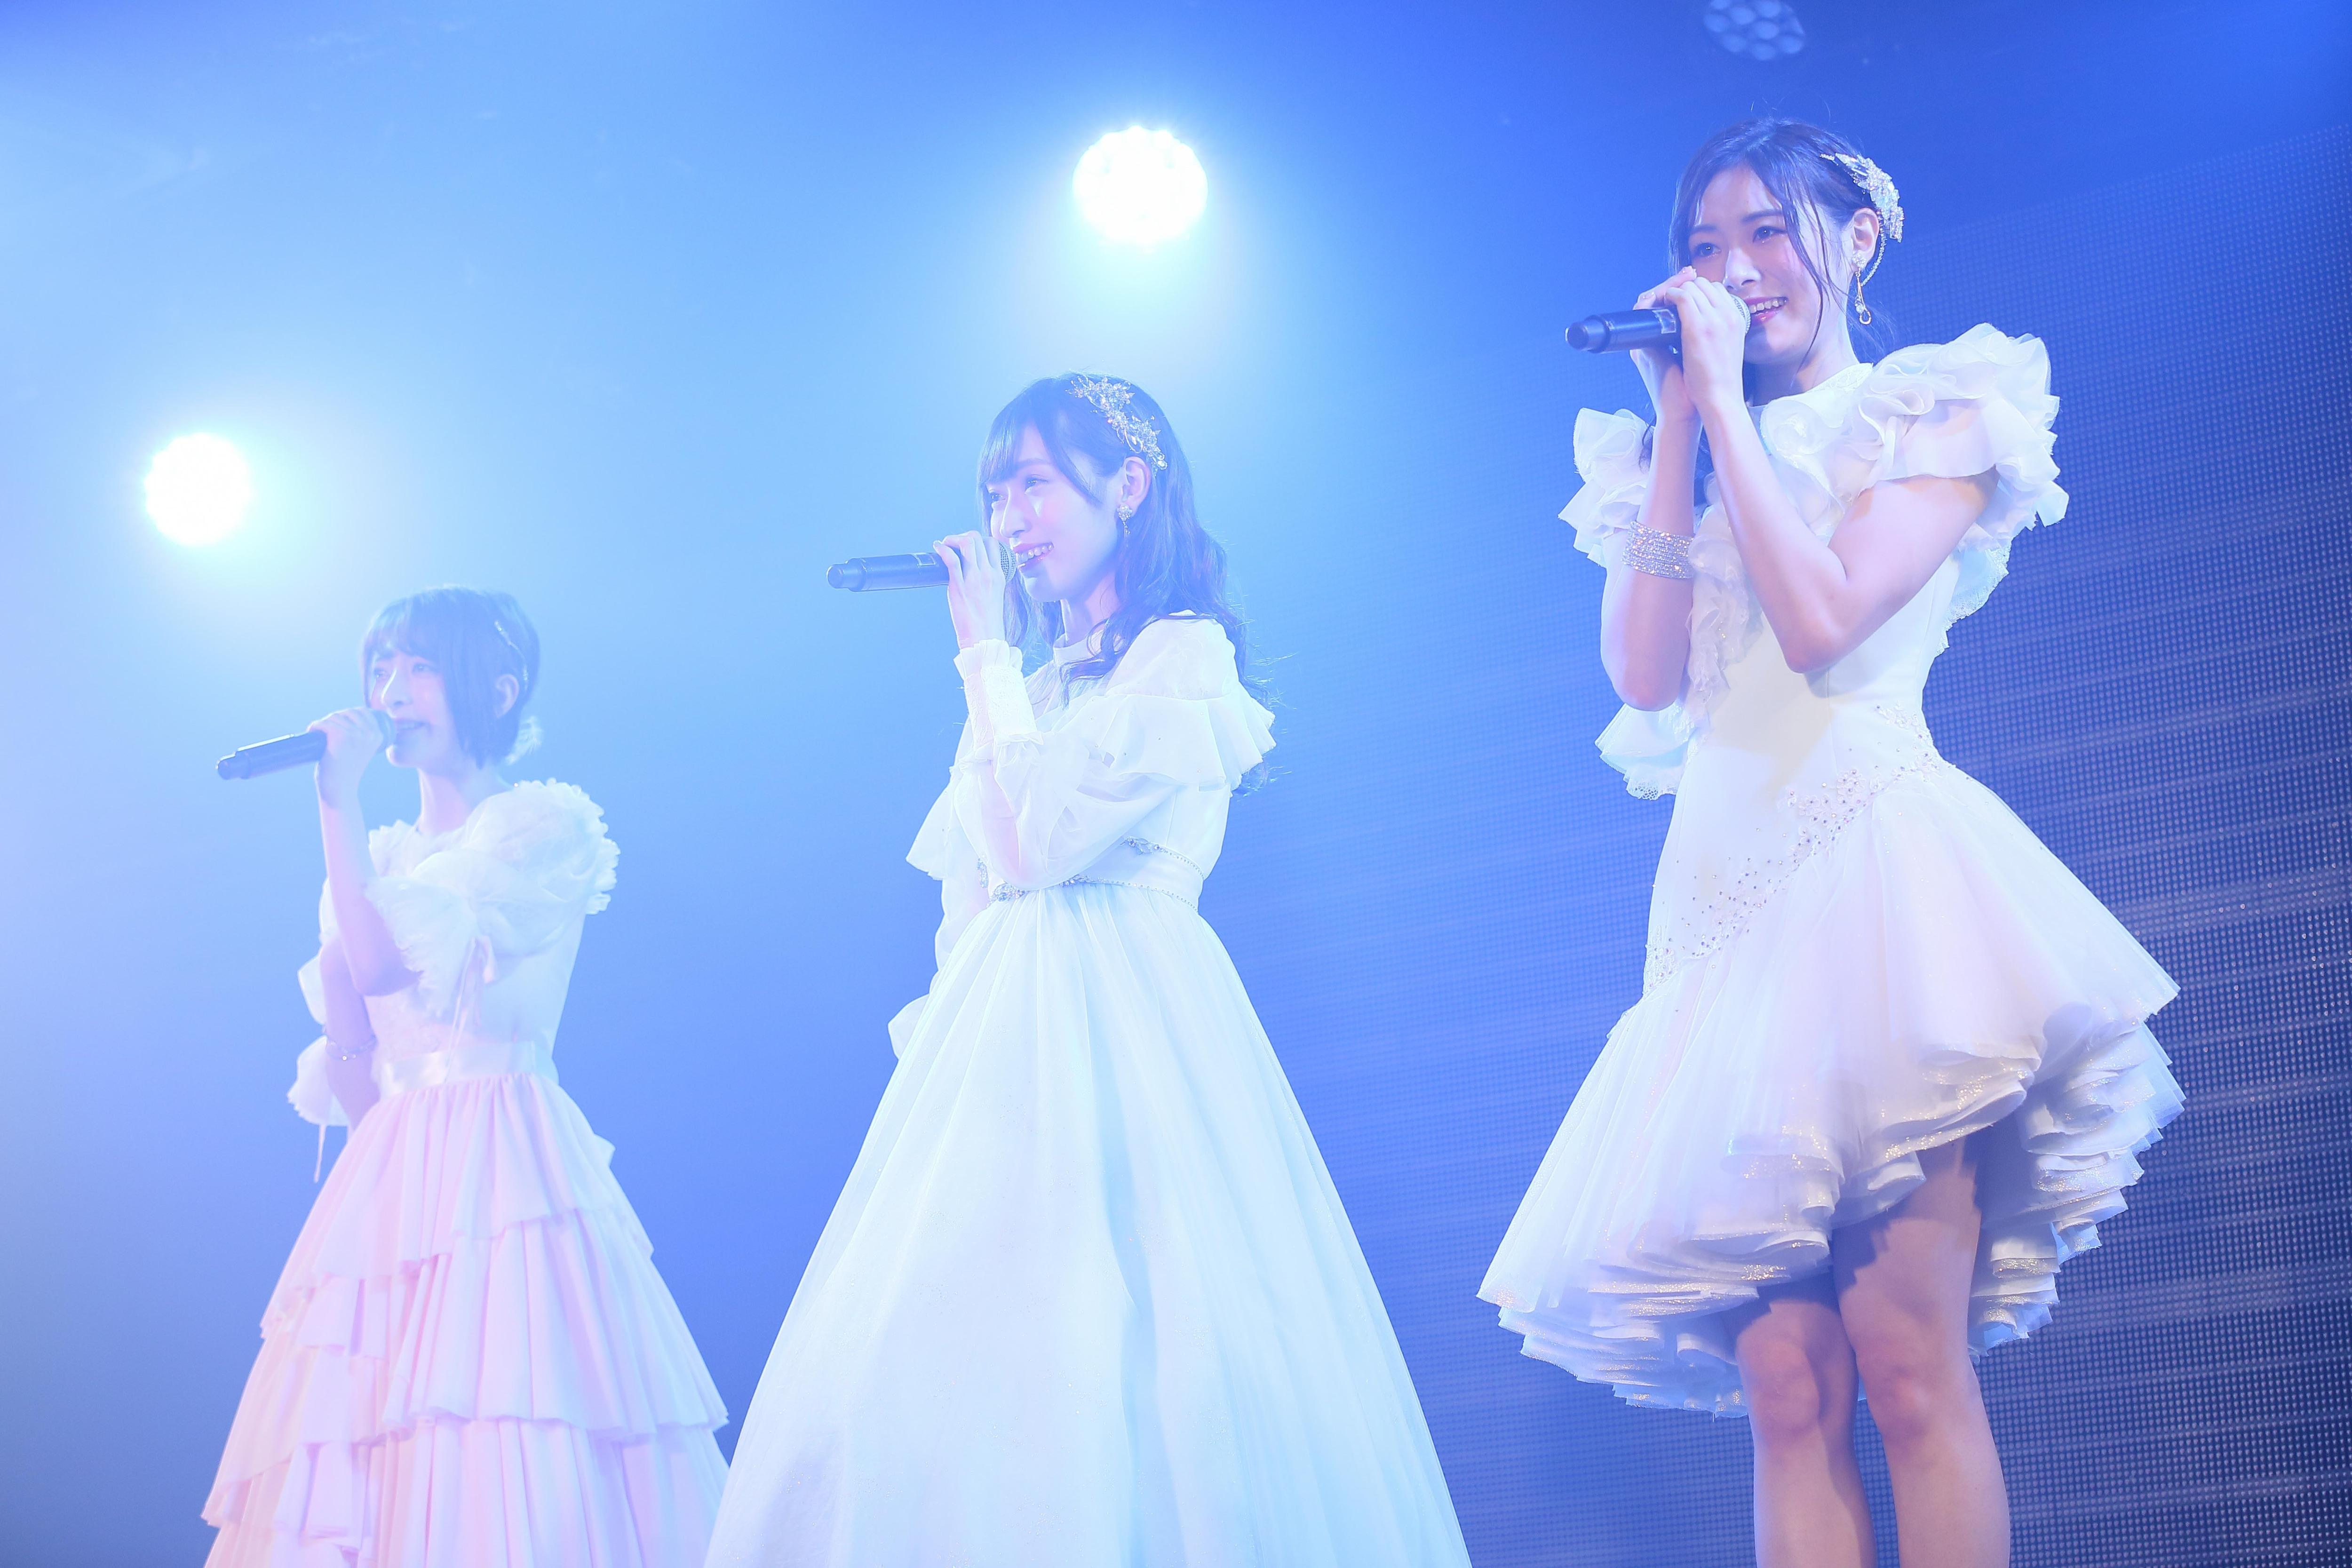 NGT48⼭⼝真帆、菅原りこ、⻑⾕川玲奈・卒業公演後のコメント発表!【写真14枚】の画像007